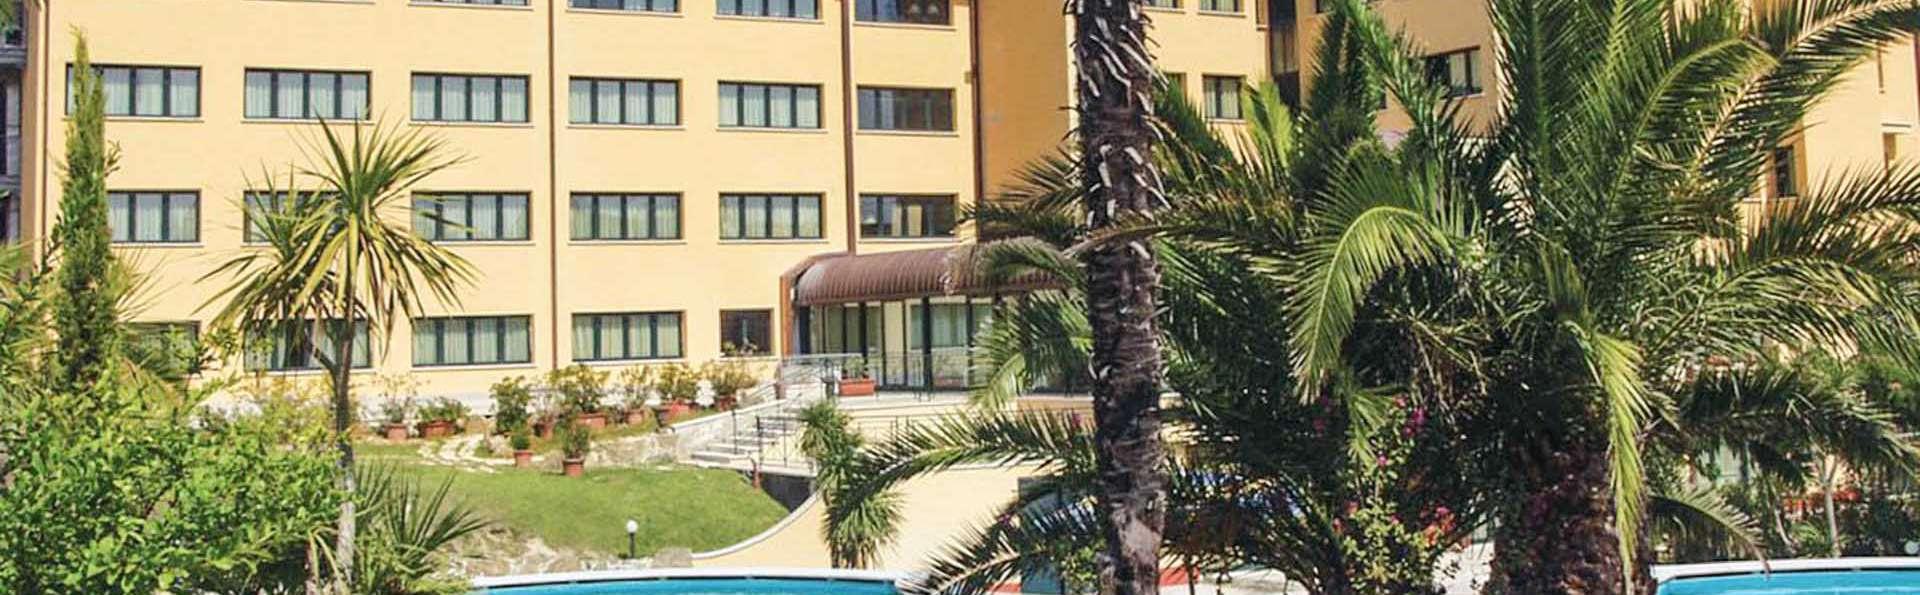 Grand Hotel San Marco - EDIT_POOL_01.jpg